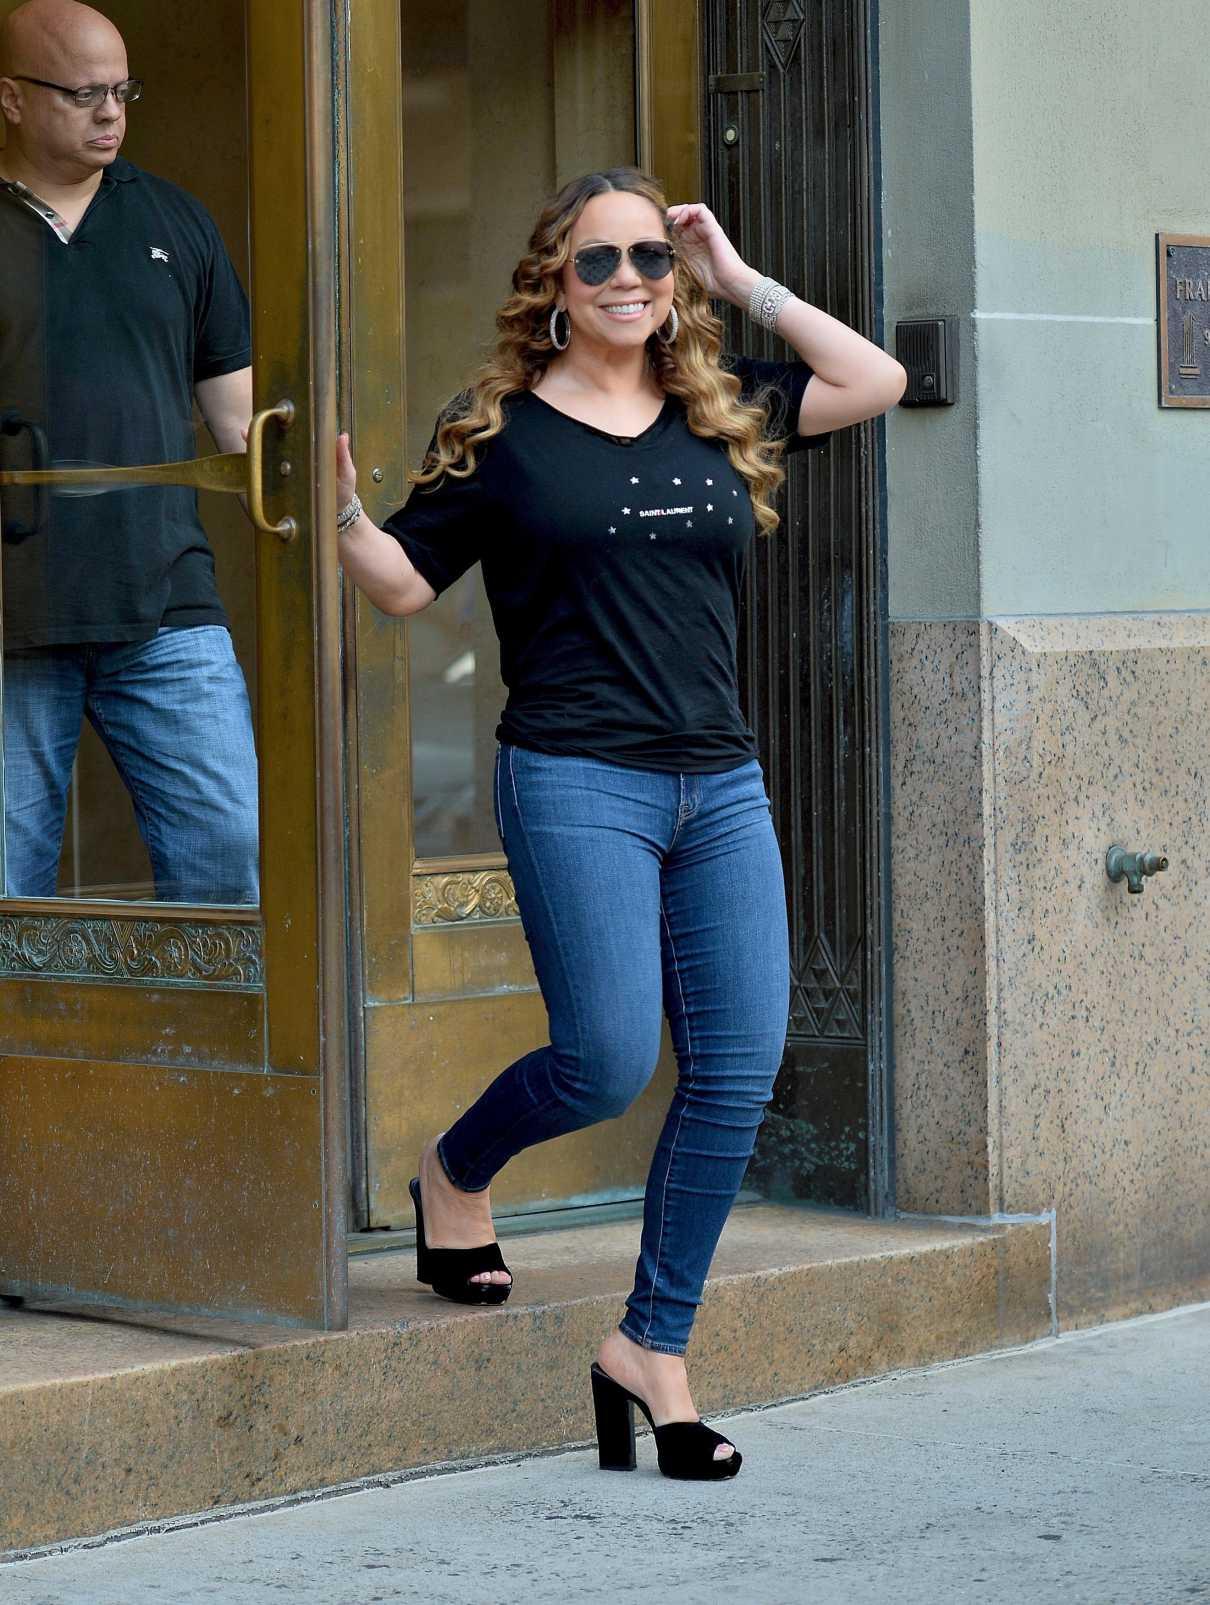 Mariah Carey in a Black Tee